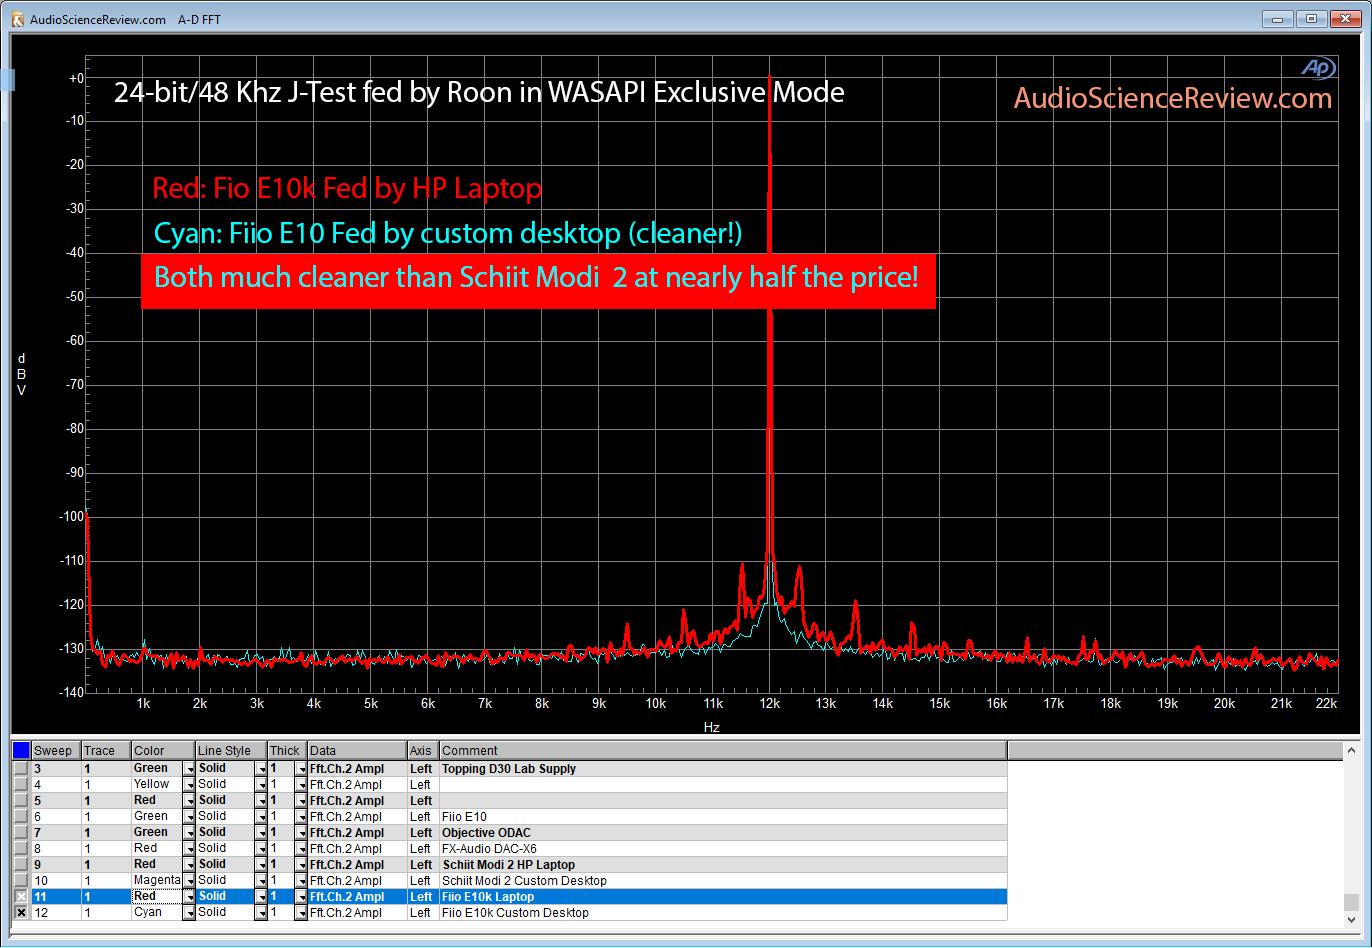 Fiio E10k Desktop Compared to Laptop.png